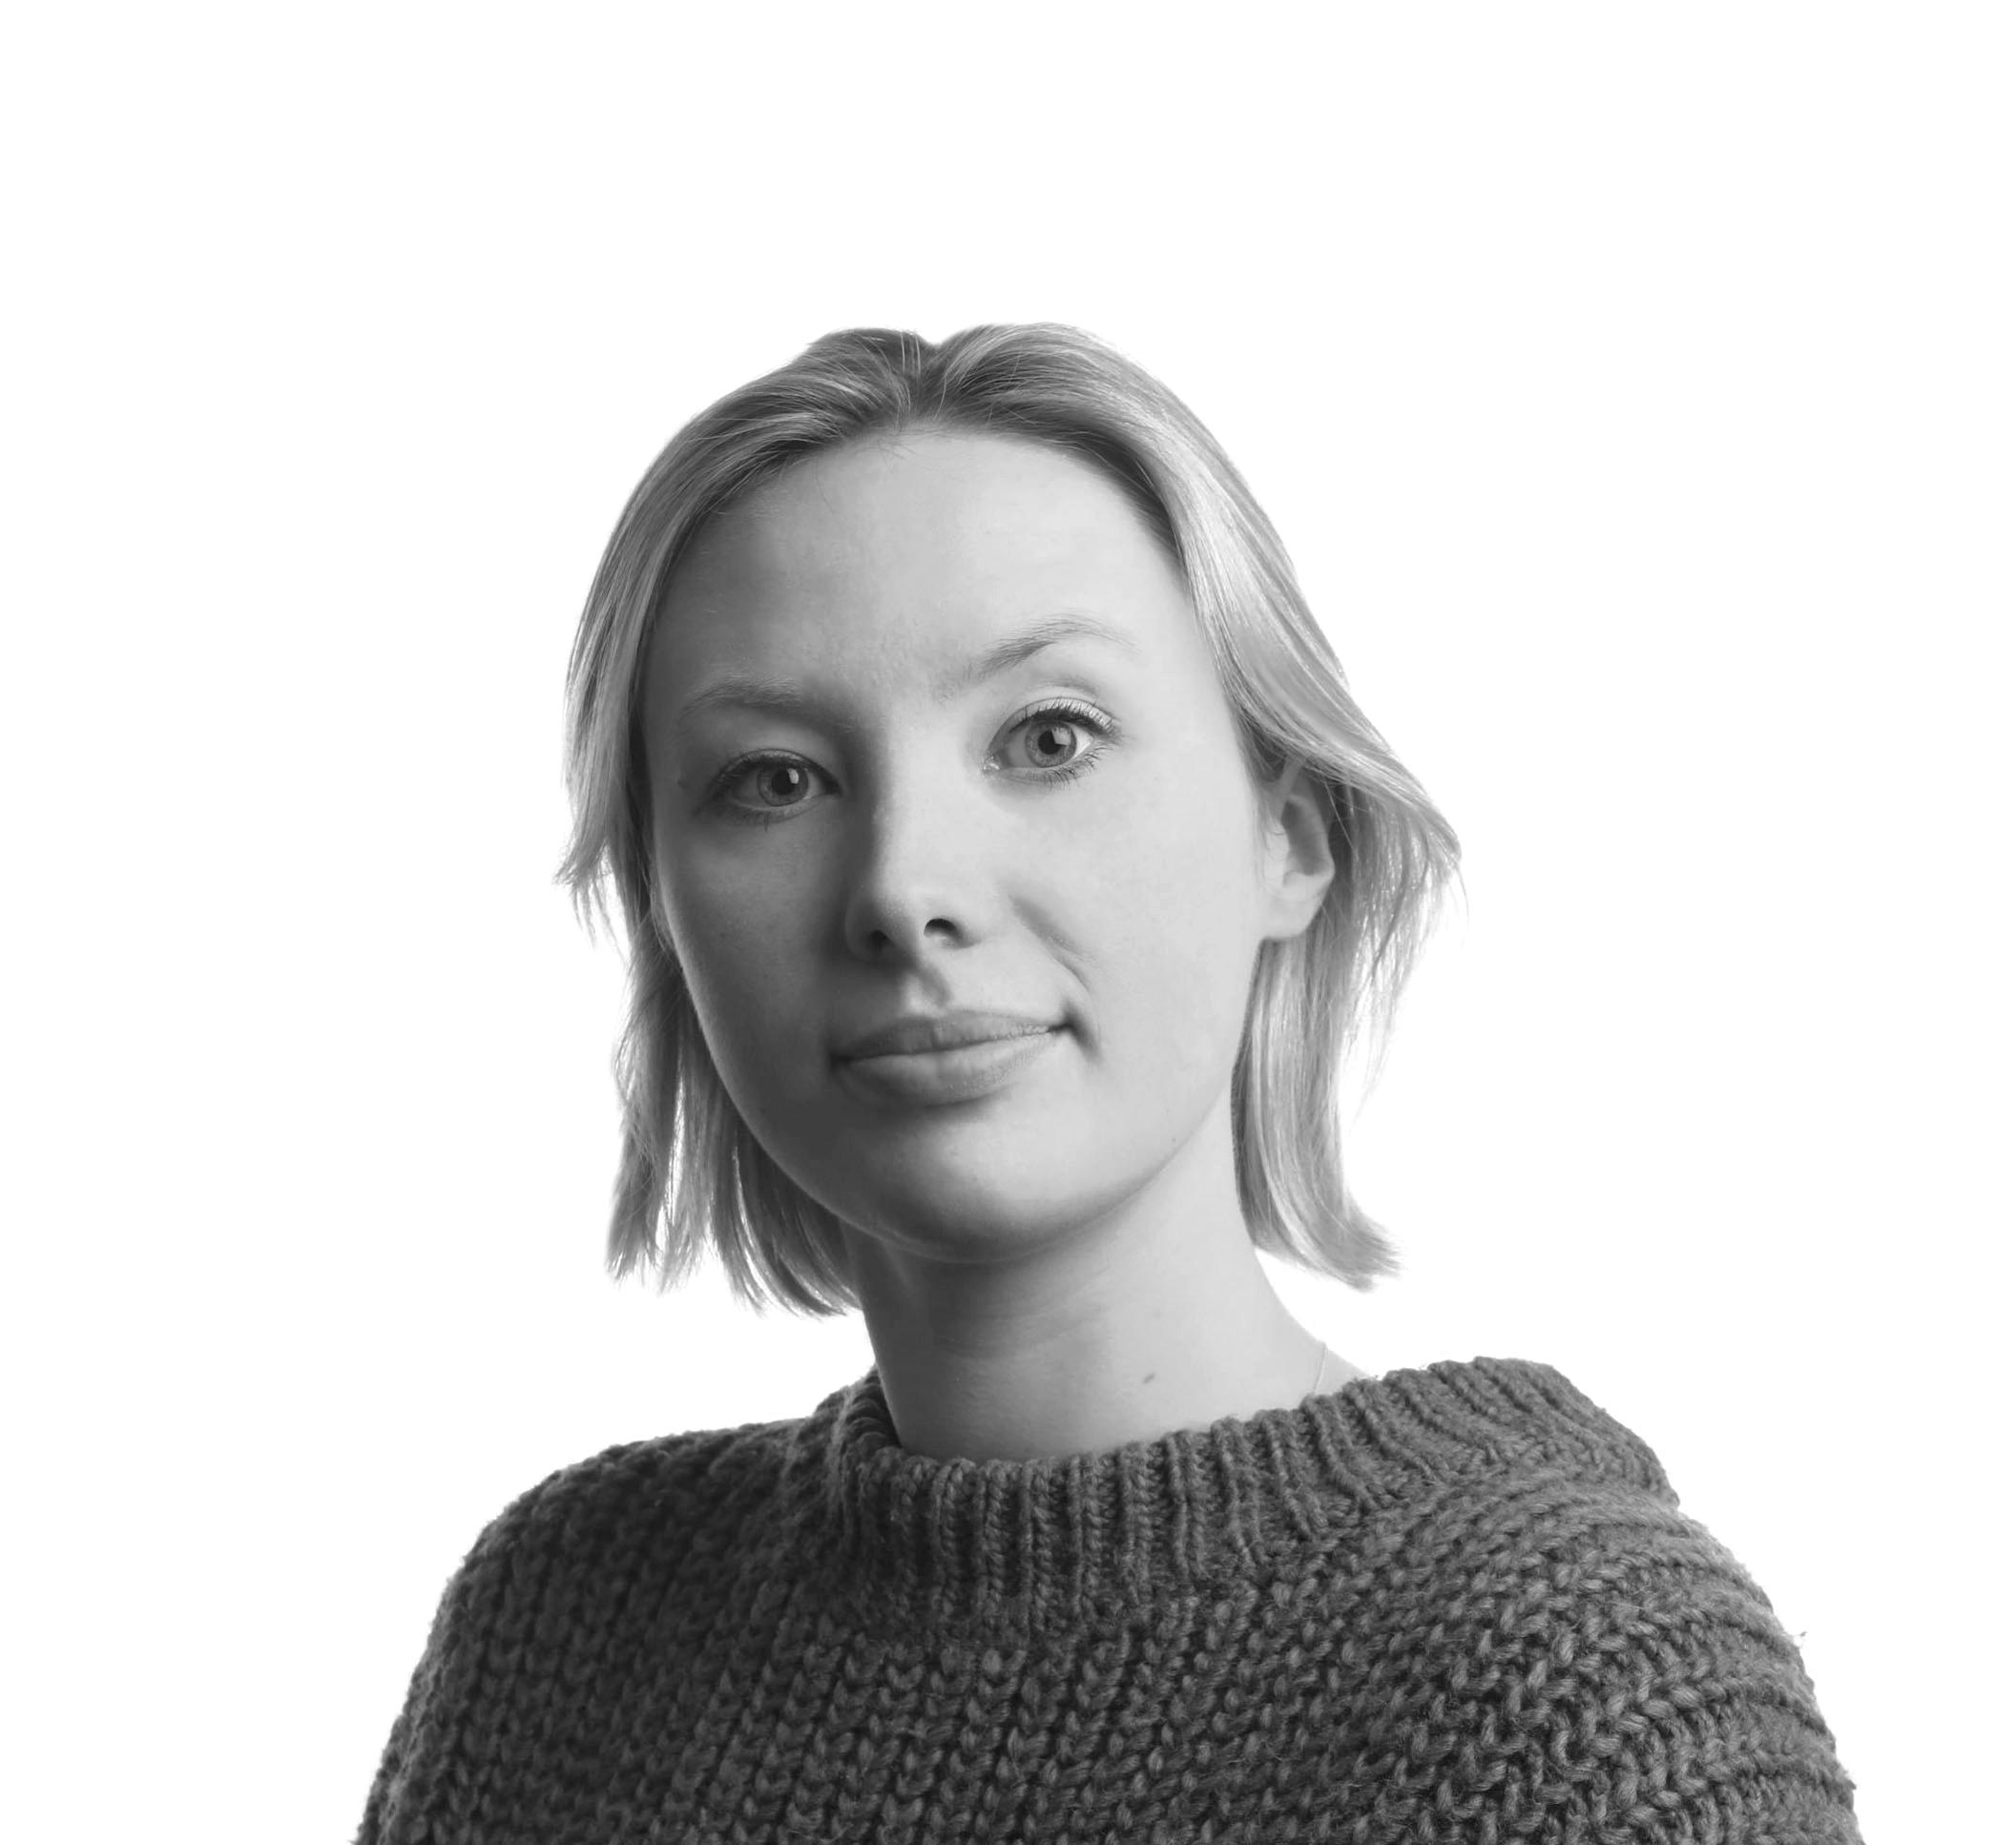 Elenor Waring - profile image